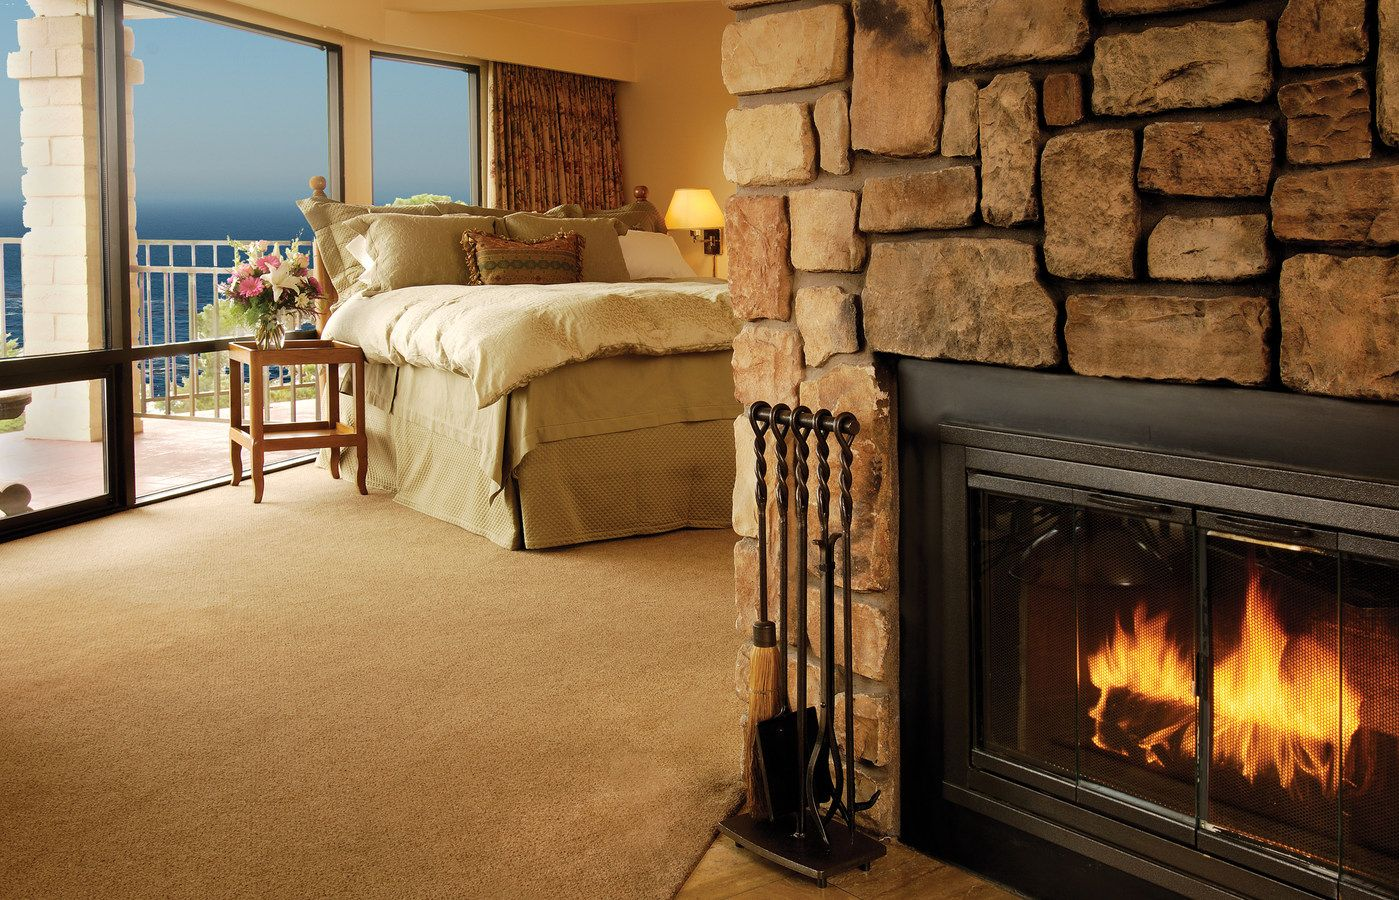 Luxury Hotels Carmel Ca Tickle Pink Inn Sur California August Trip Pinterest And Hotel